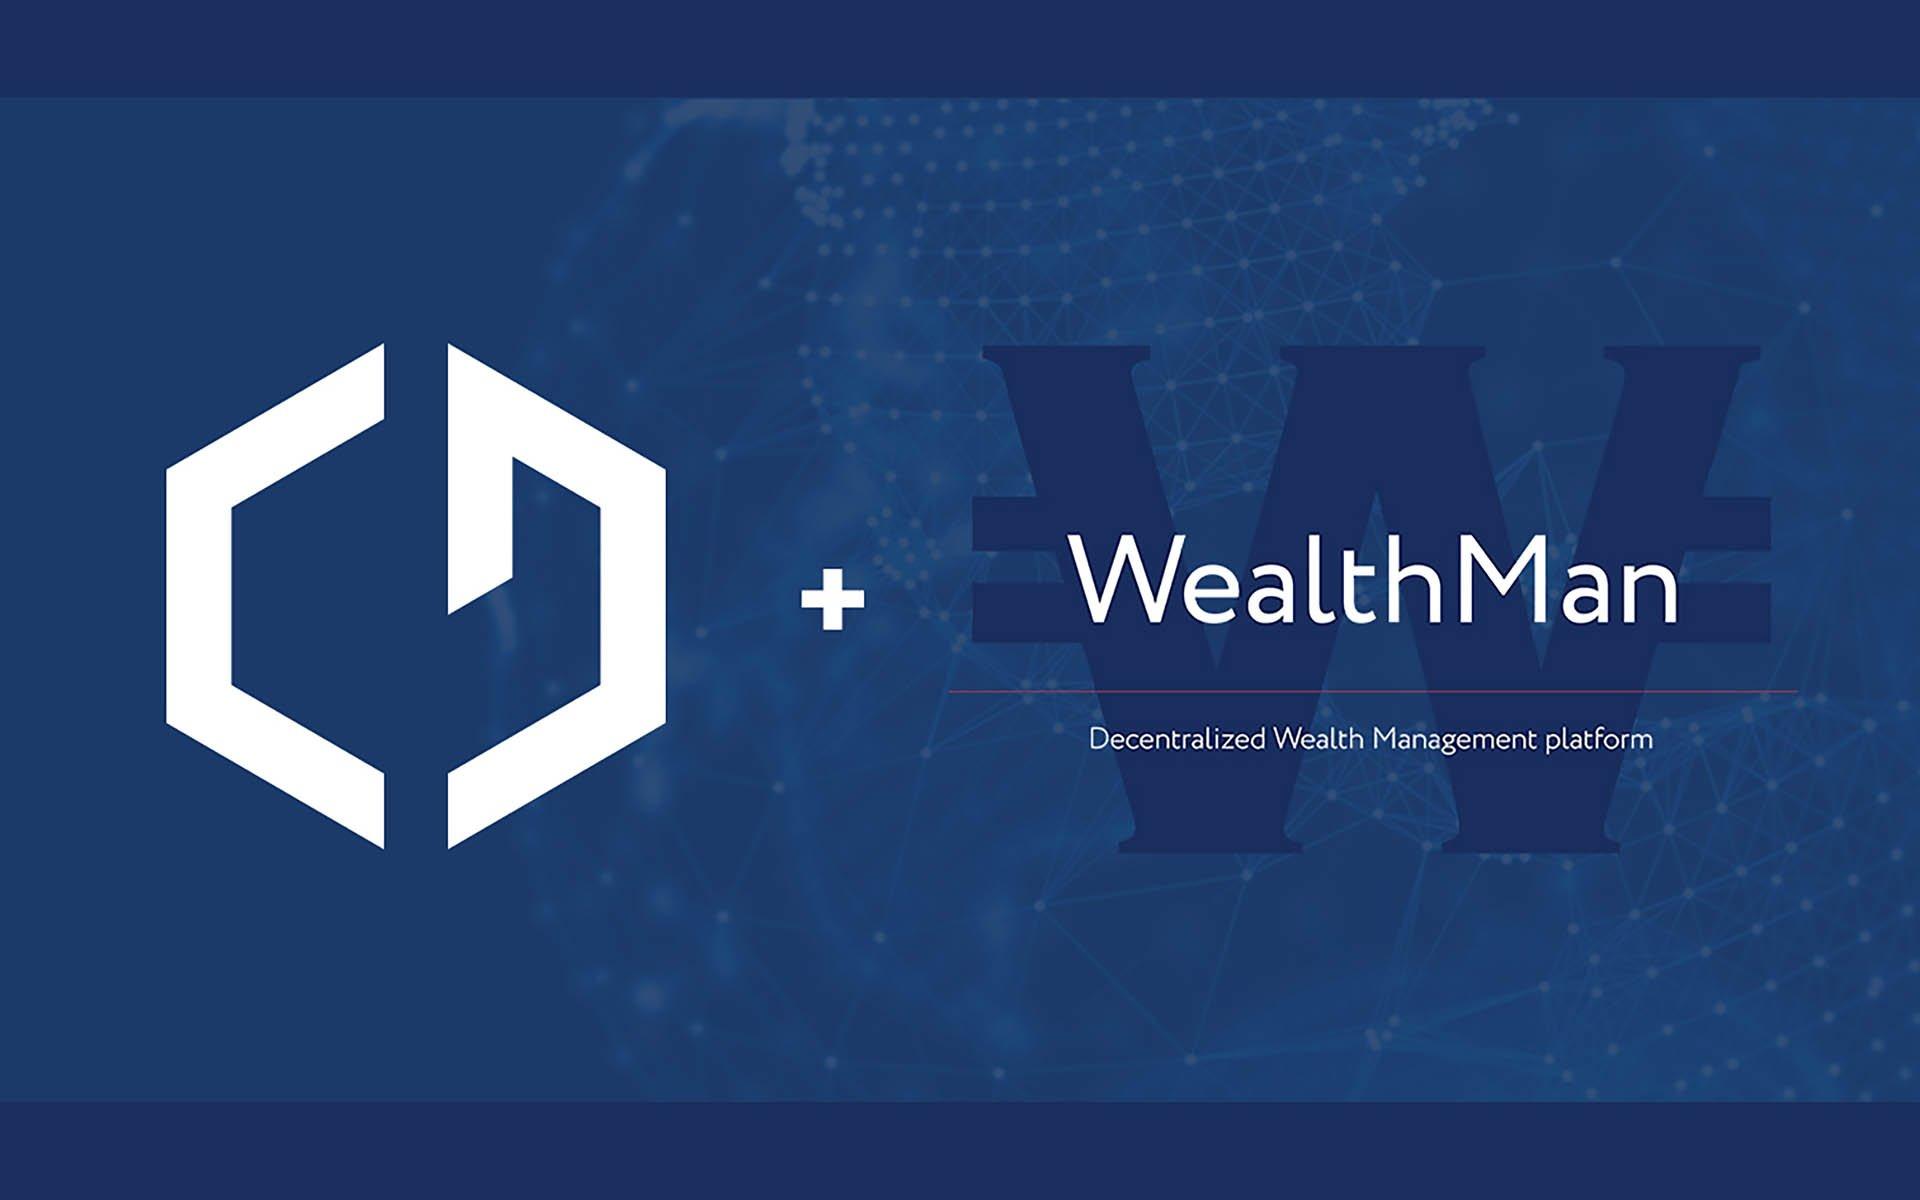 Confideal Announces Cooperation with WealthMan Wealth Management Platform